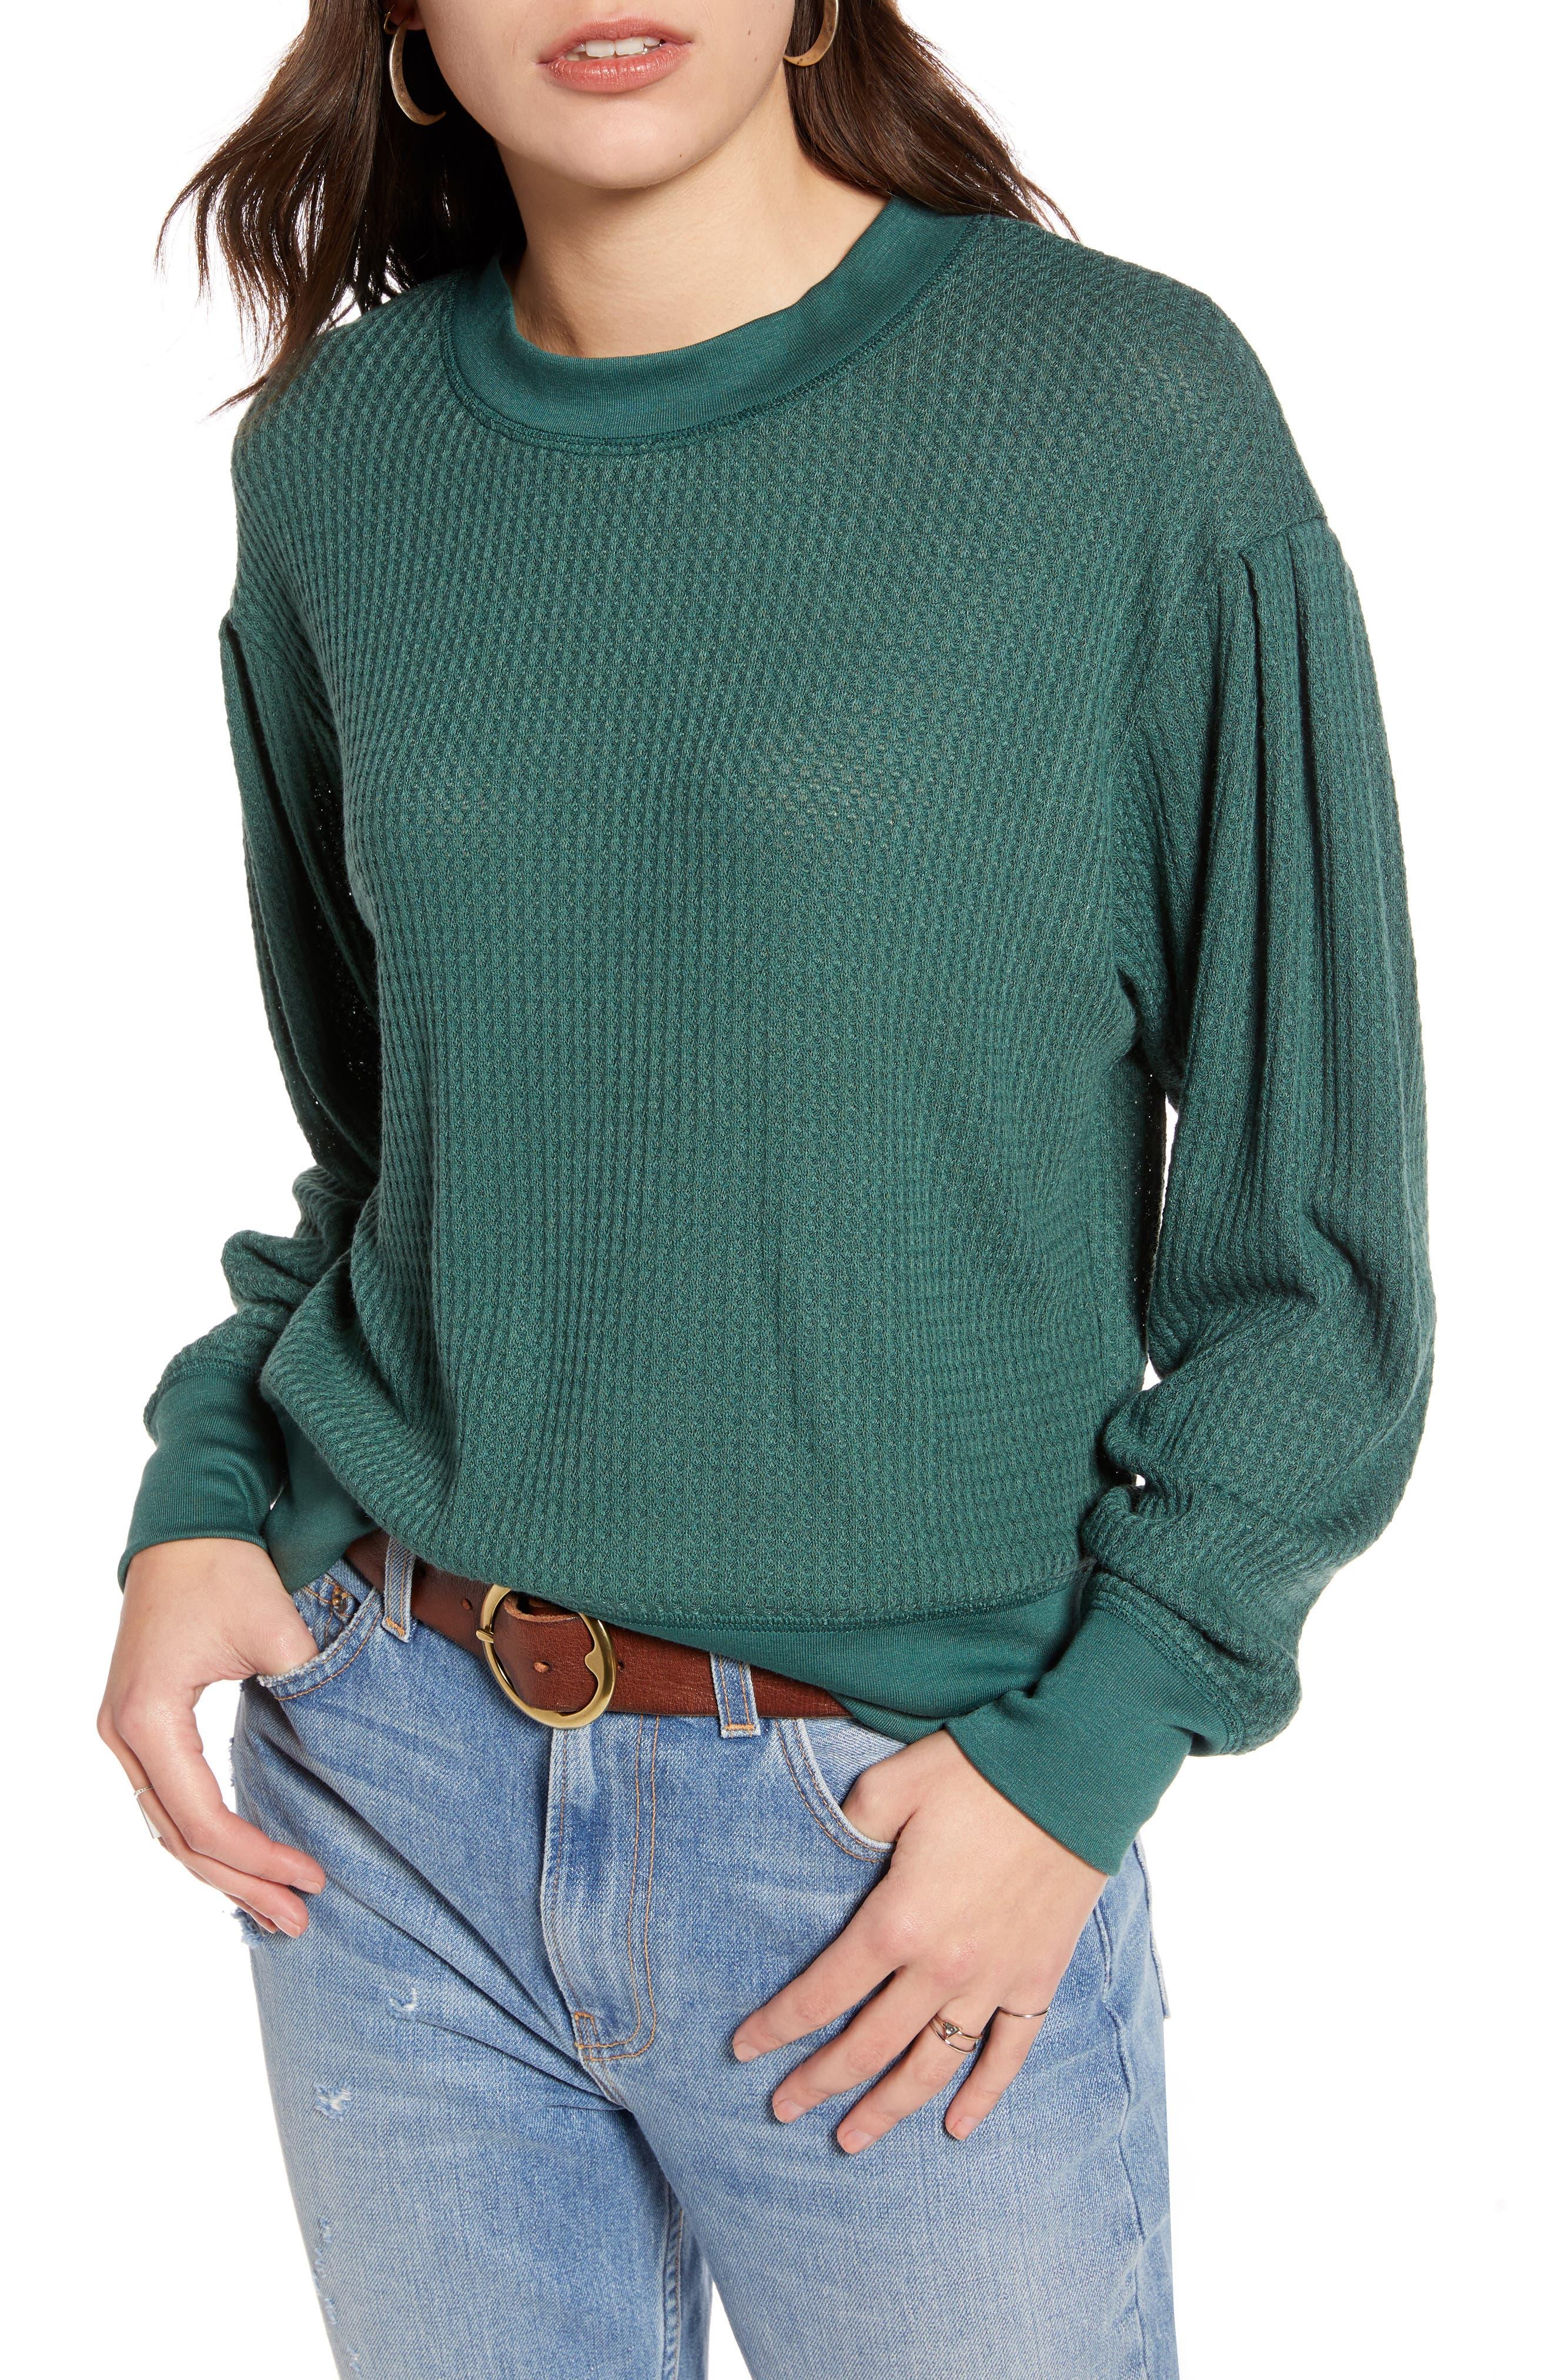 Treasure & Bond Puff Sleeve Sweatshirt